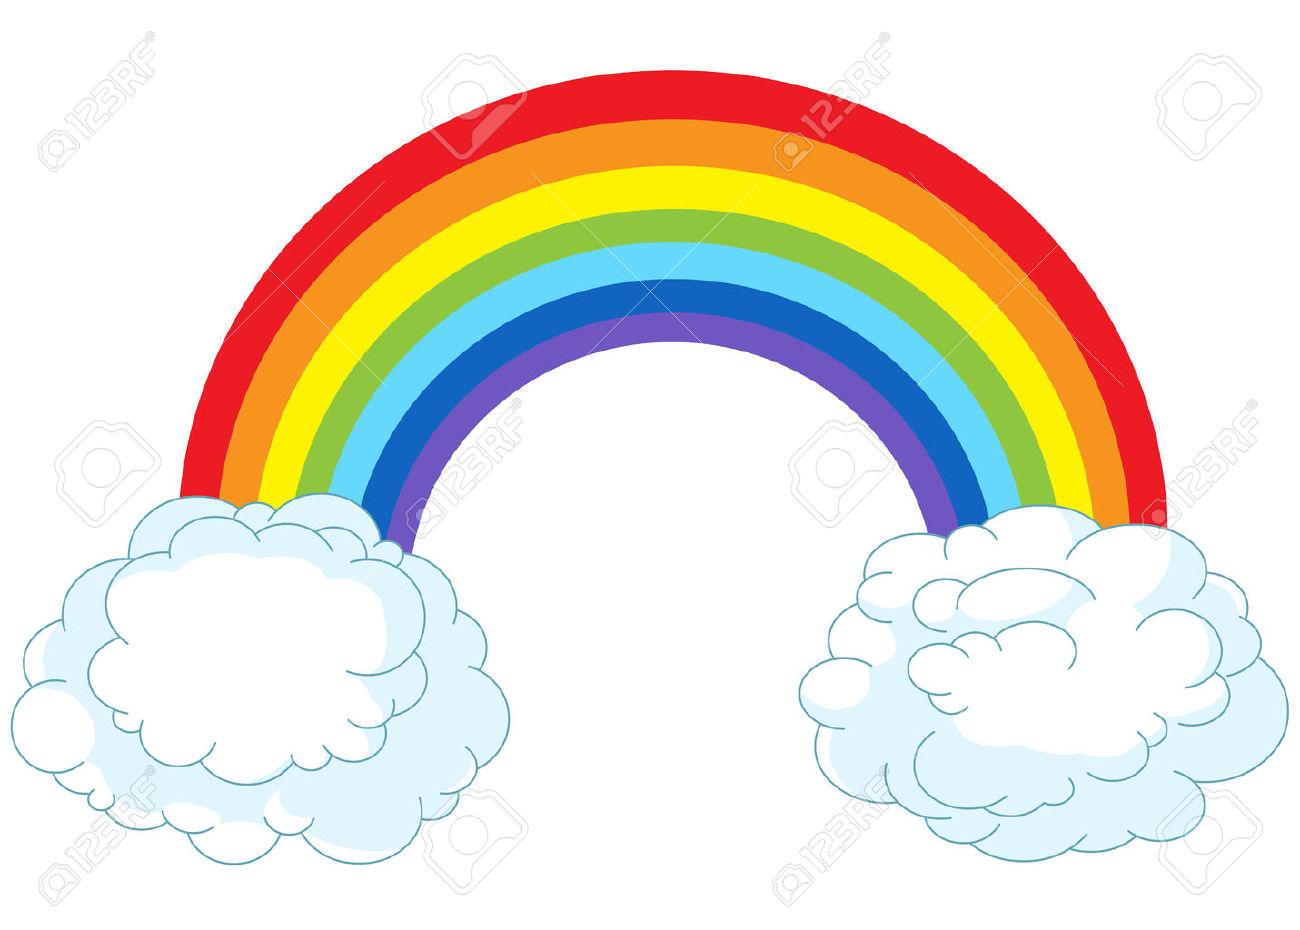 1300x930 Cartoon Rainbows Collection